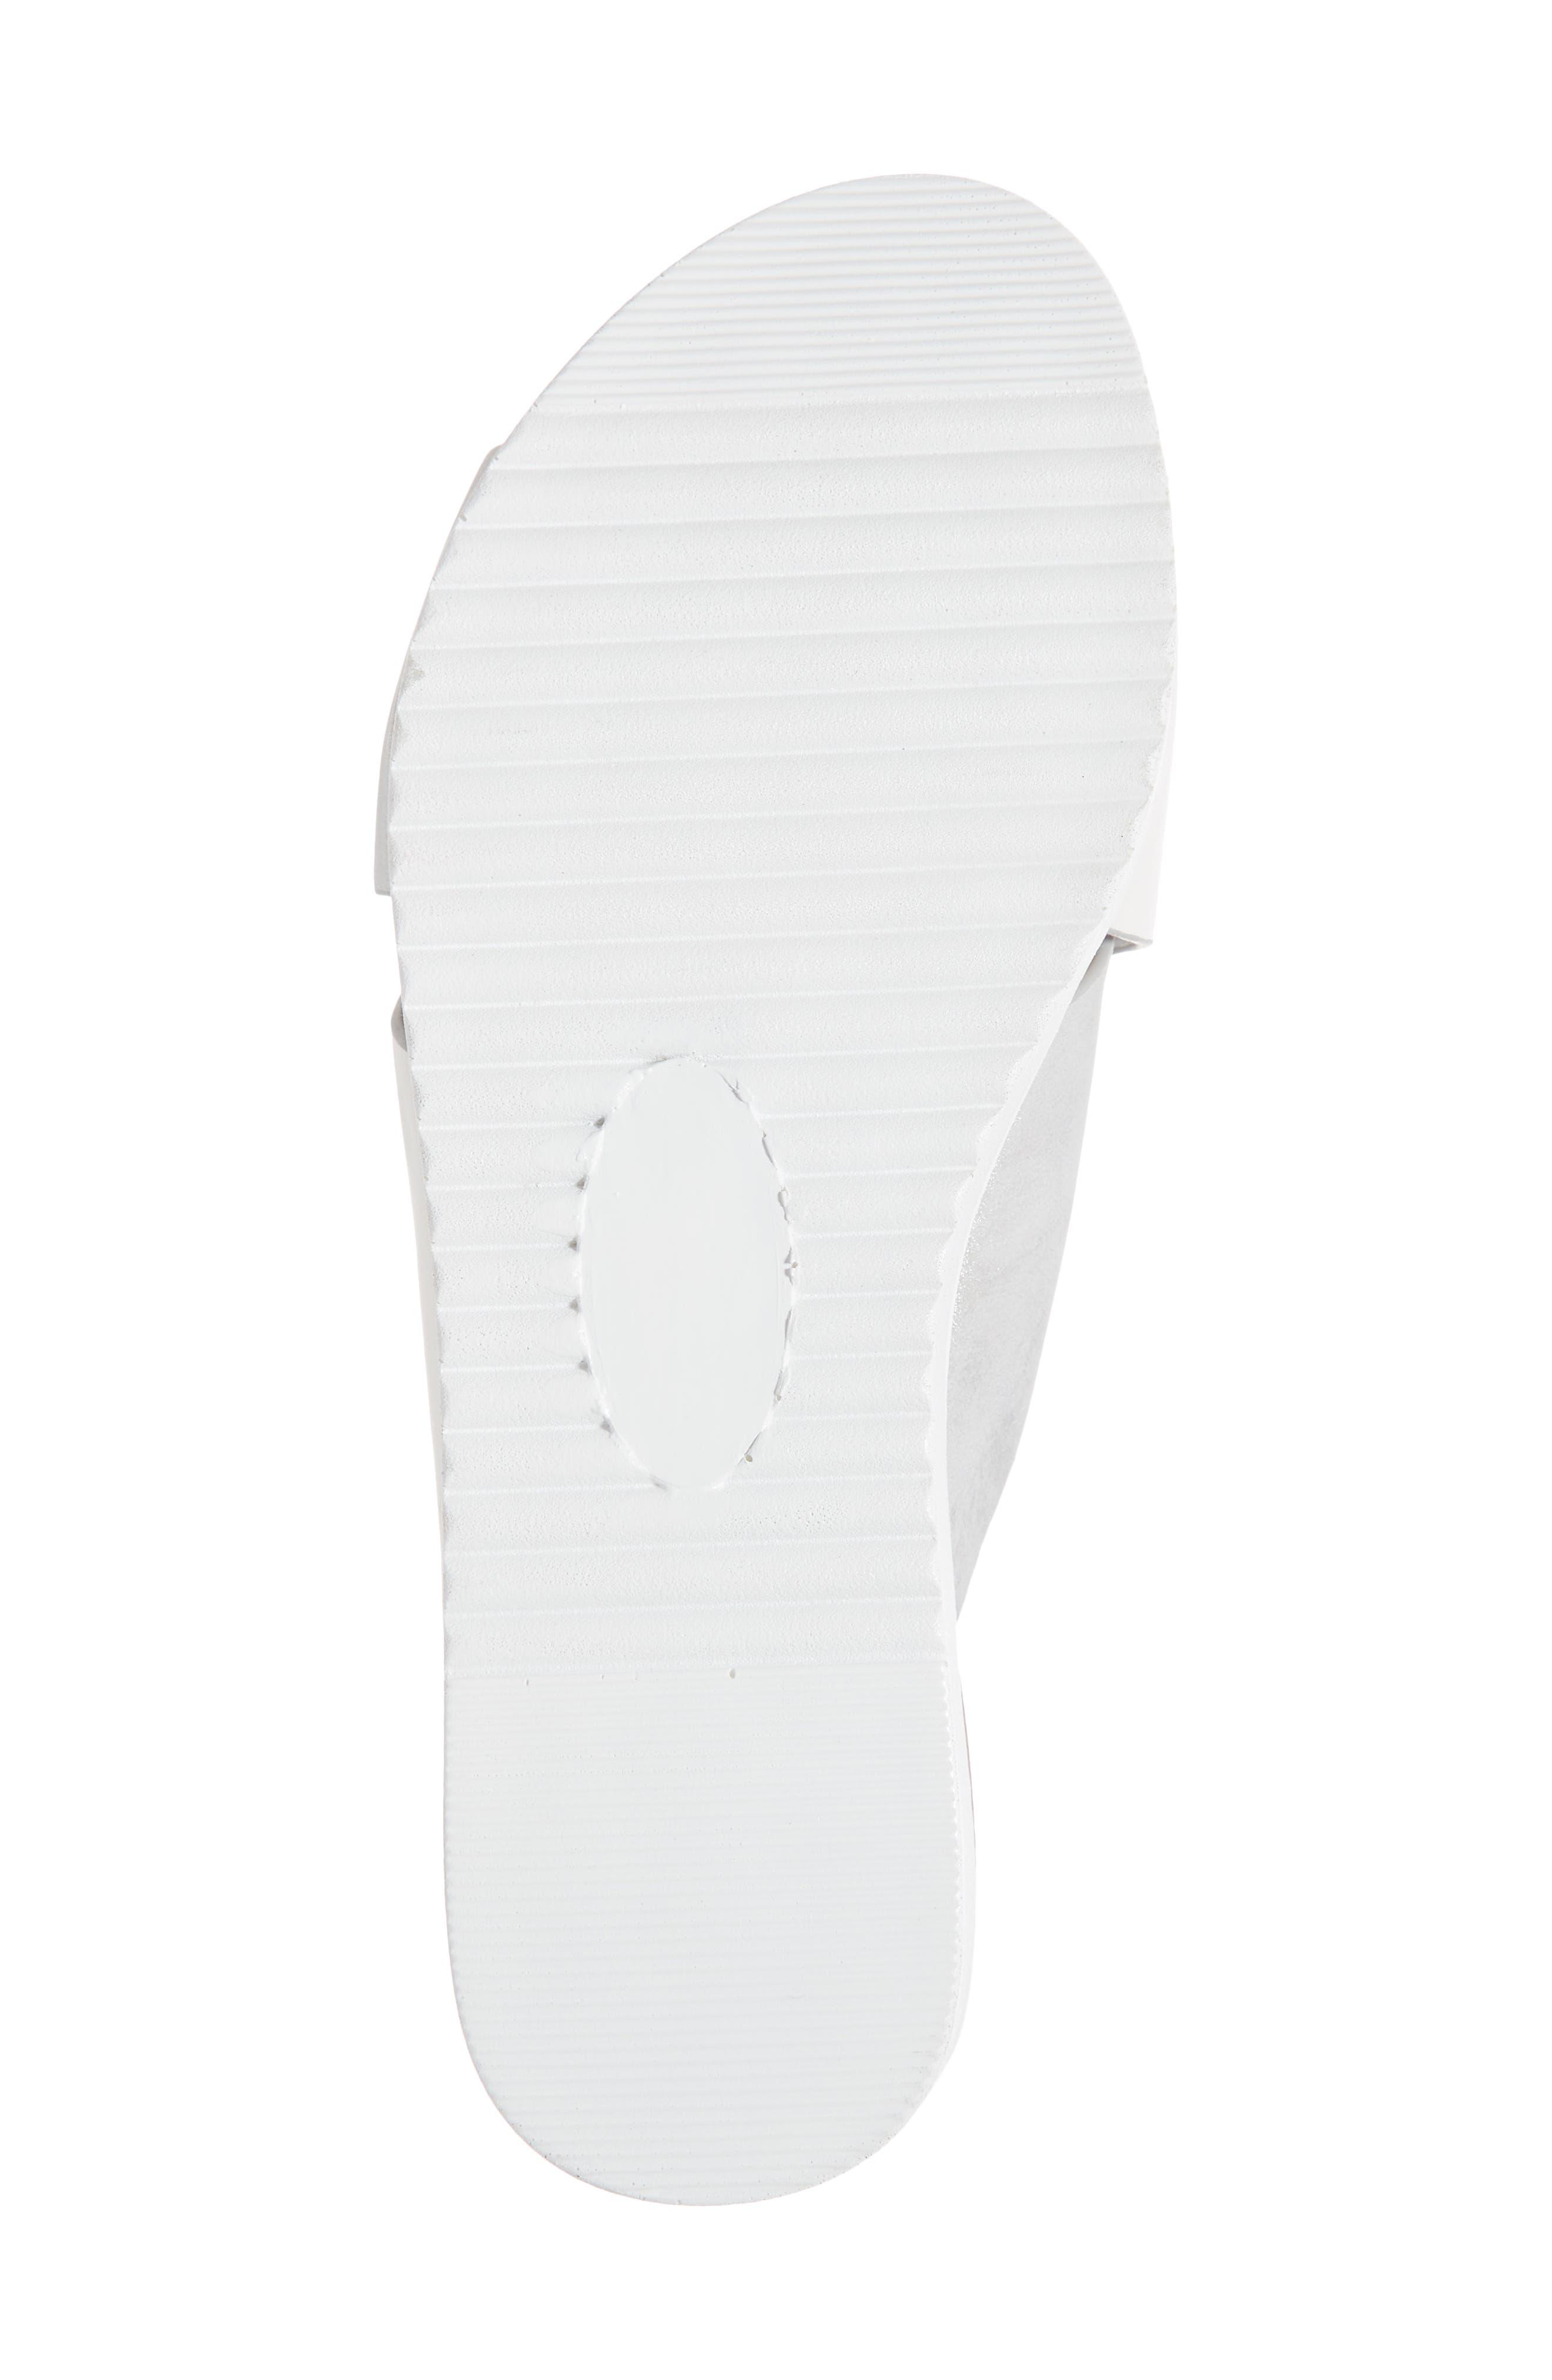 Rwon Slide Sandal,                             Alternate thumbnail 6, color,                             WHITE/ SILVER LEATHER